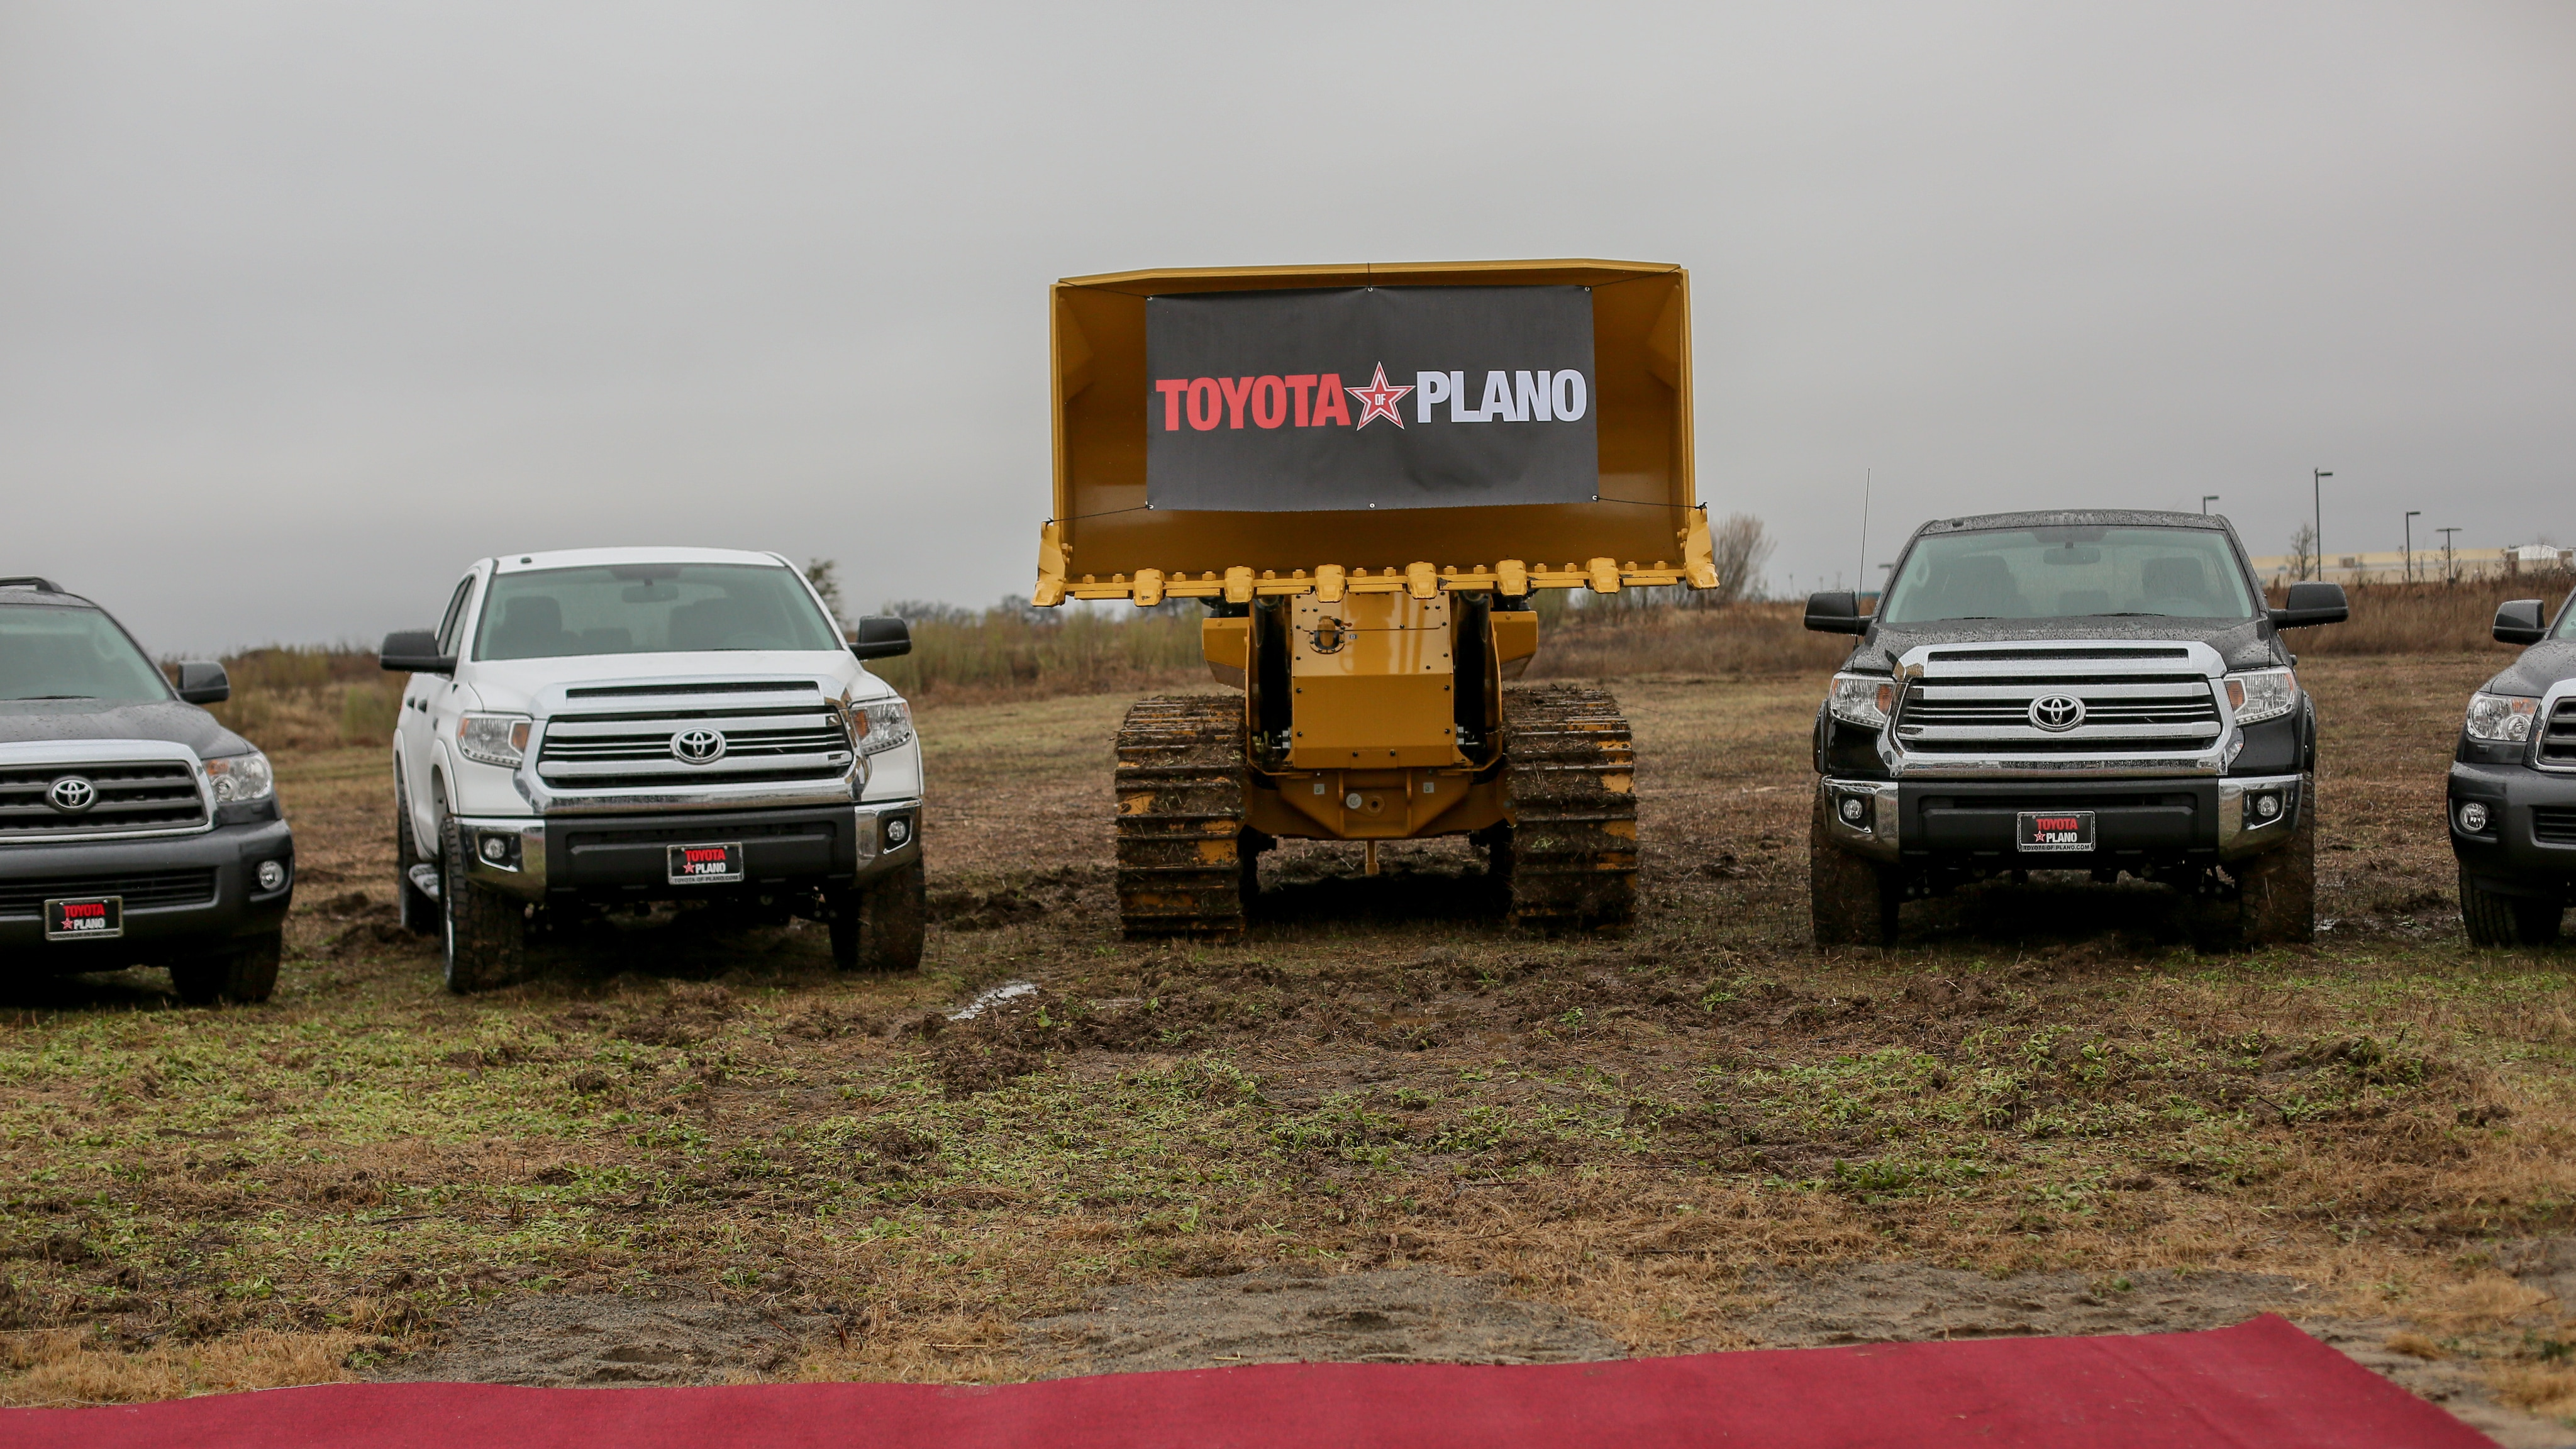 Toyota Of Plano >> Toyota Of Plano 2 0 Toyota Of Plano